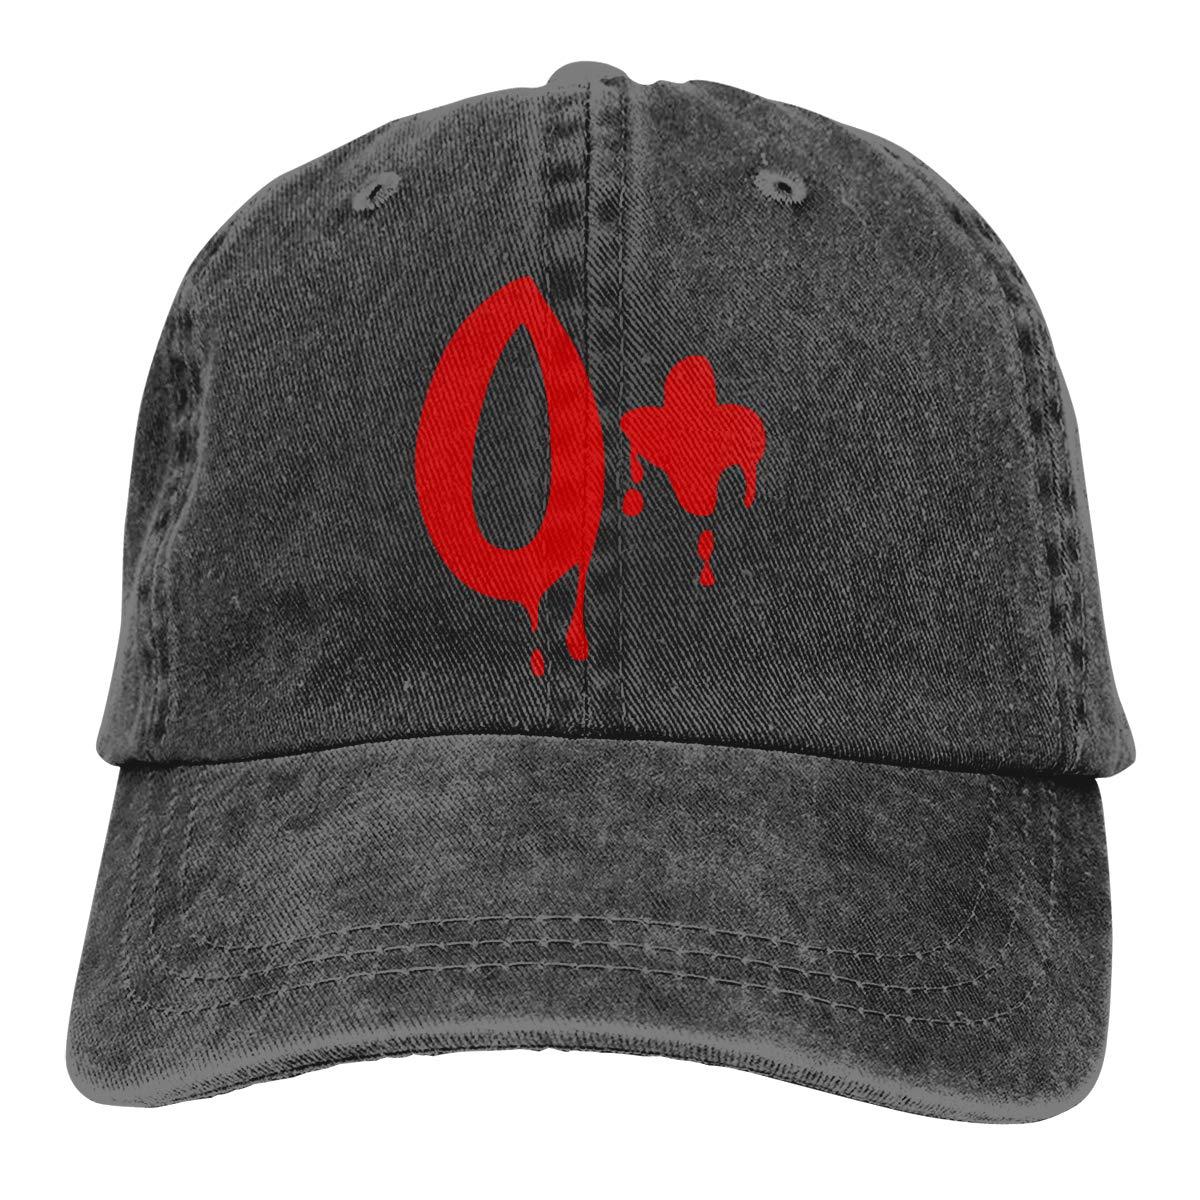 Männer & Frauen Einstellbar Baumwolle Denim Baseball Kappe Blut Gruppe O + Trucker Cap